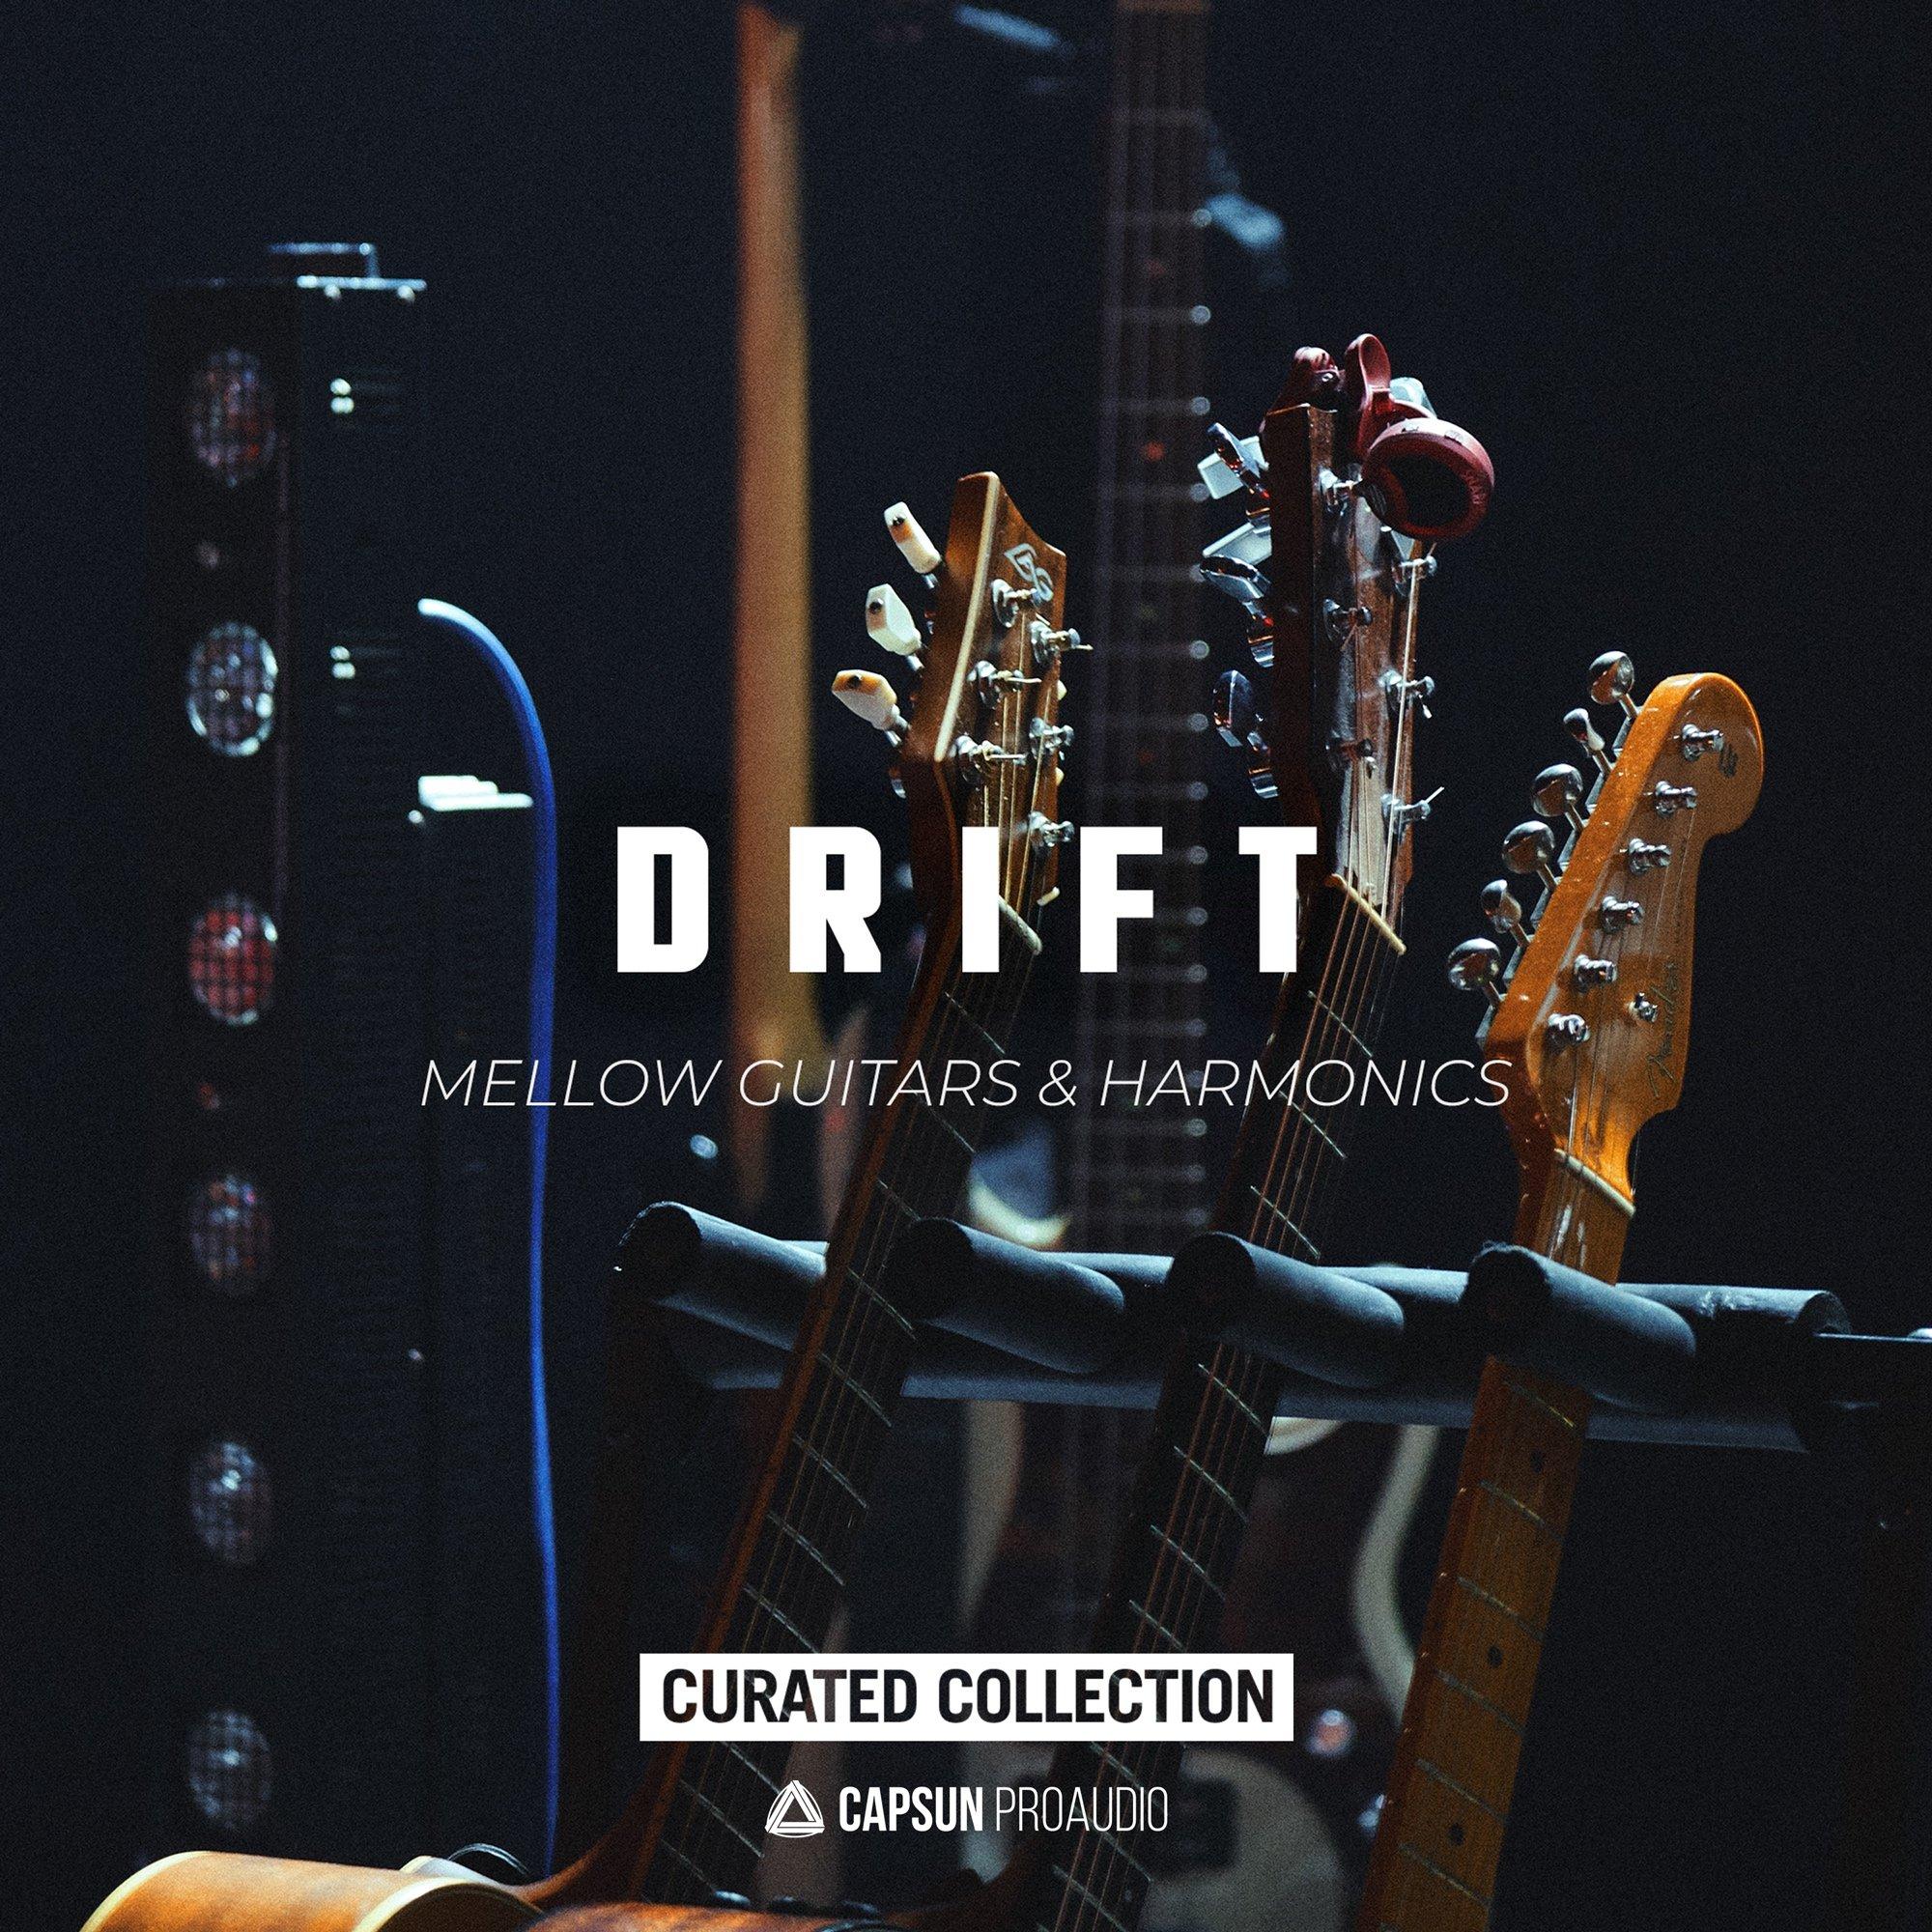 Drift Mellow Guitar Harmonics Samples And Loops Splice Sounds